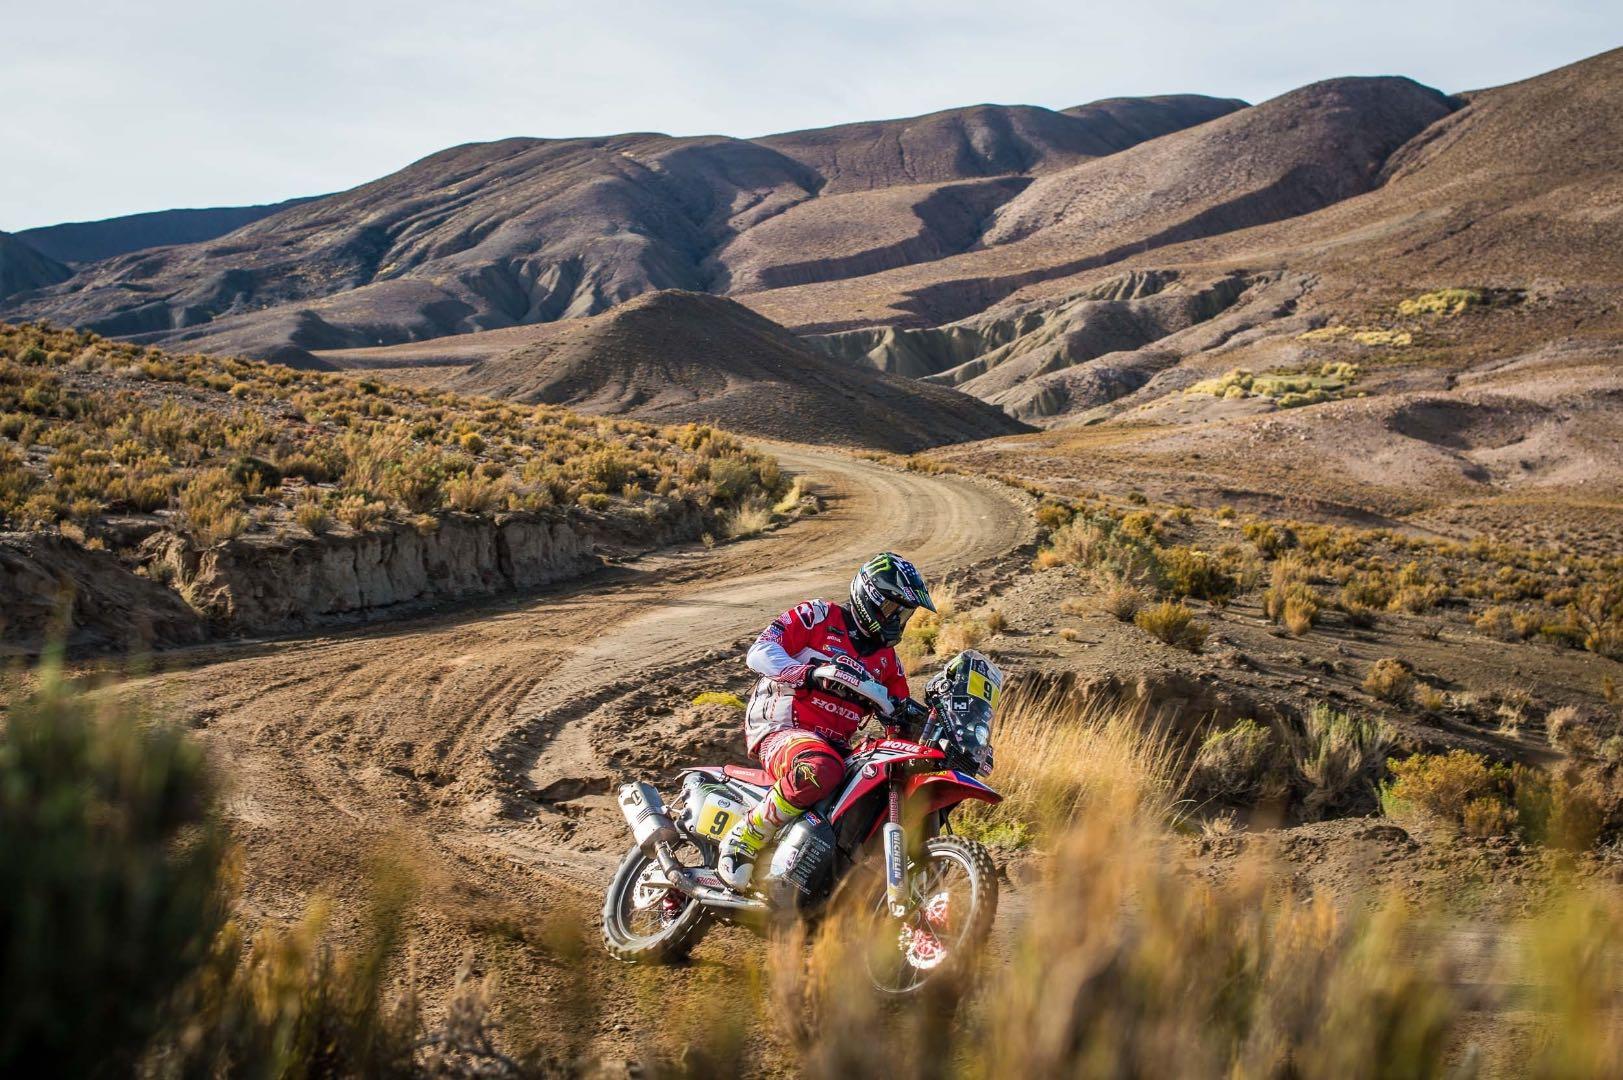 Honda Ricky Brabec 8th overall after 2017 Dakar Rally stage 4